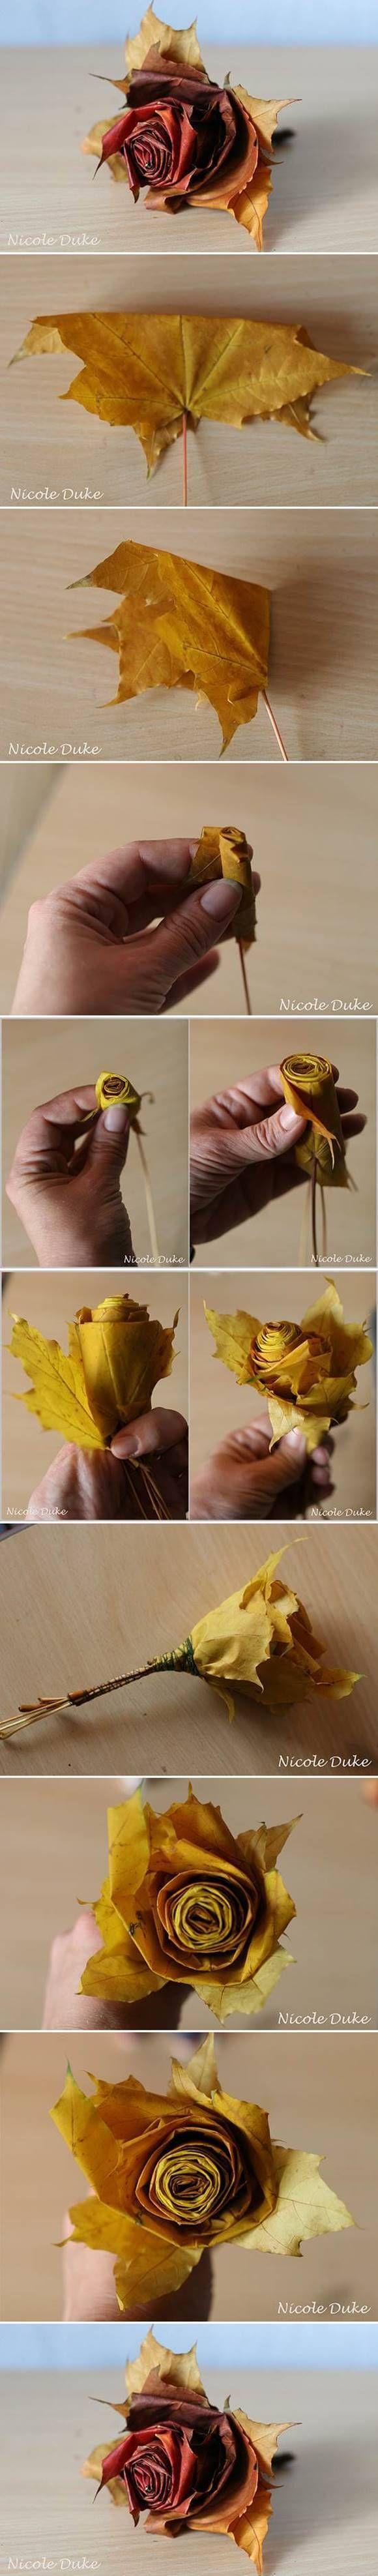 How to Make Beautiful Maple Leaf Rose #craft #leaf #decorating